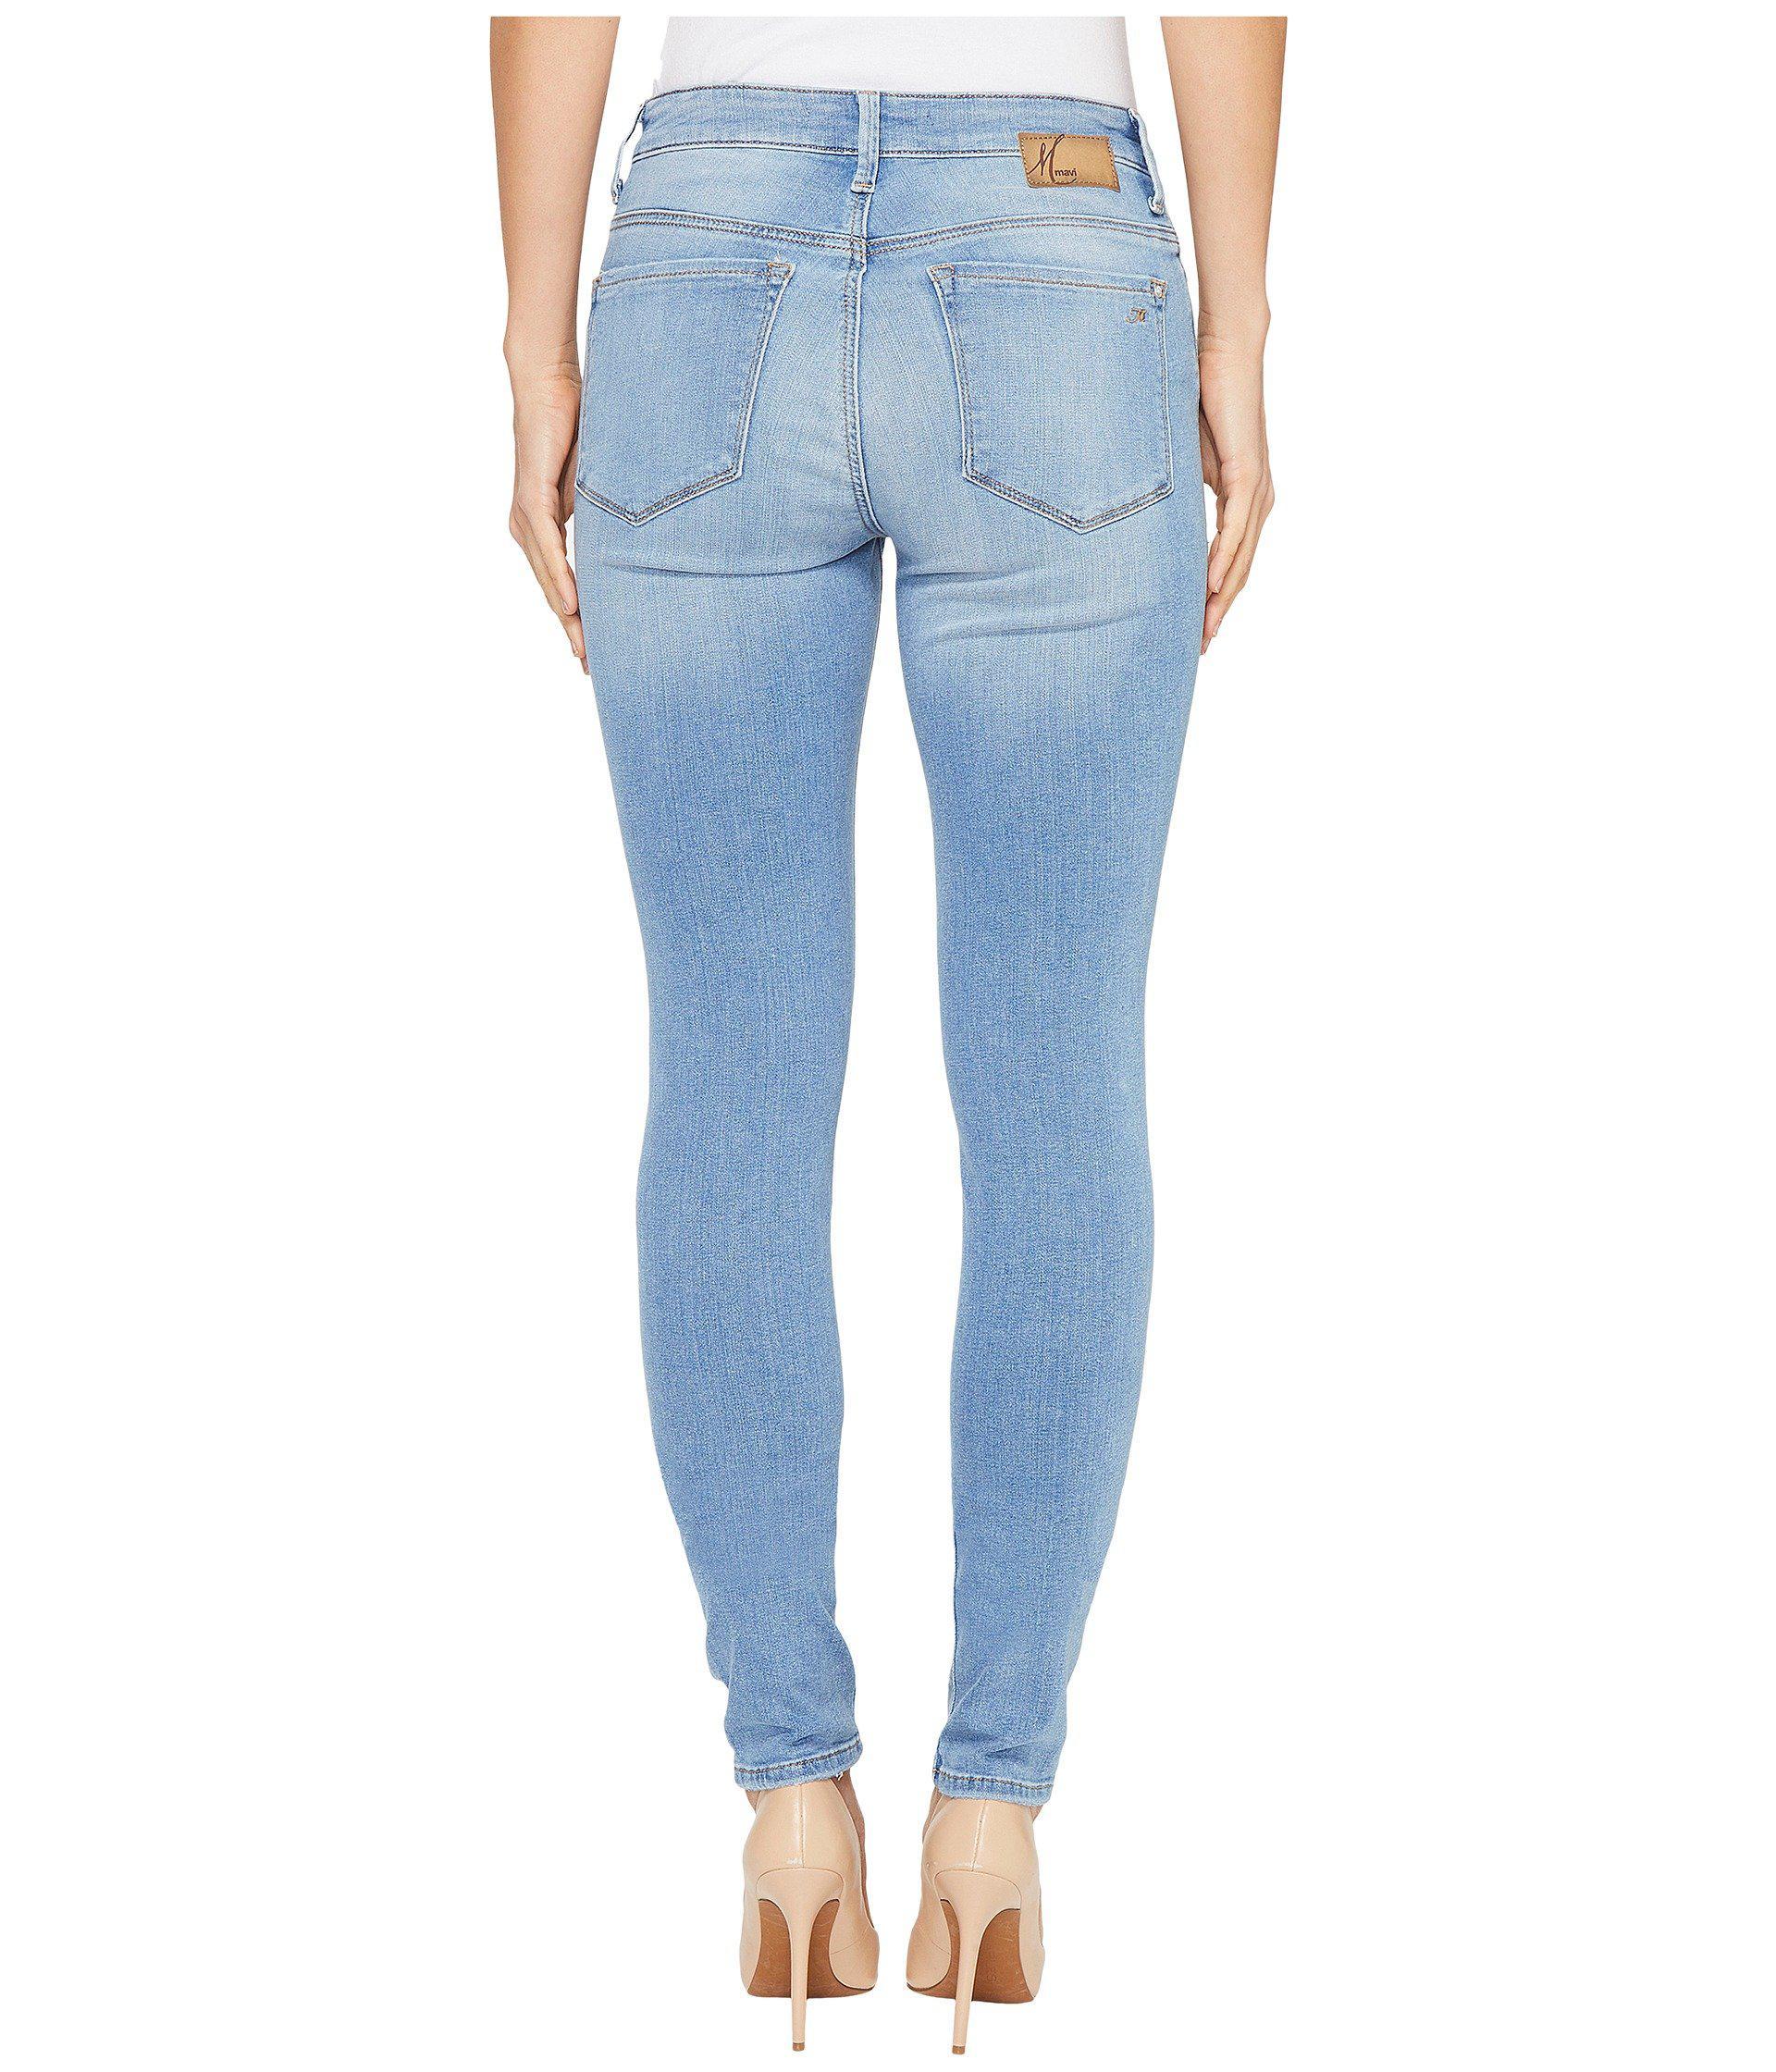 Alissa dark blue high-rise skinny jean Mavi Shop For For Sale UoVPpOa